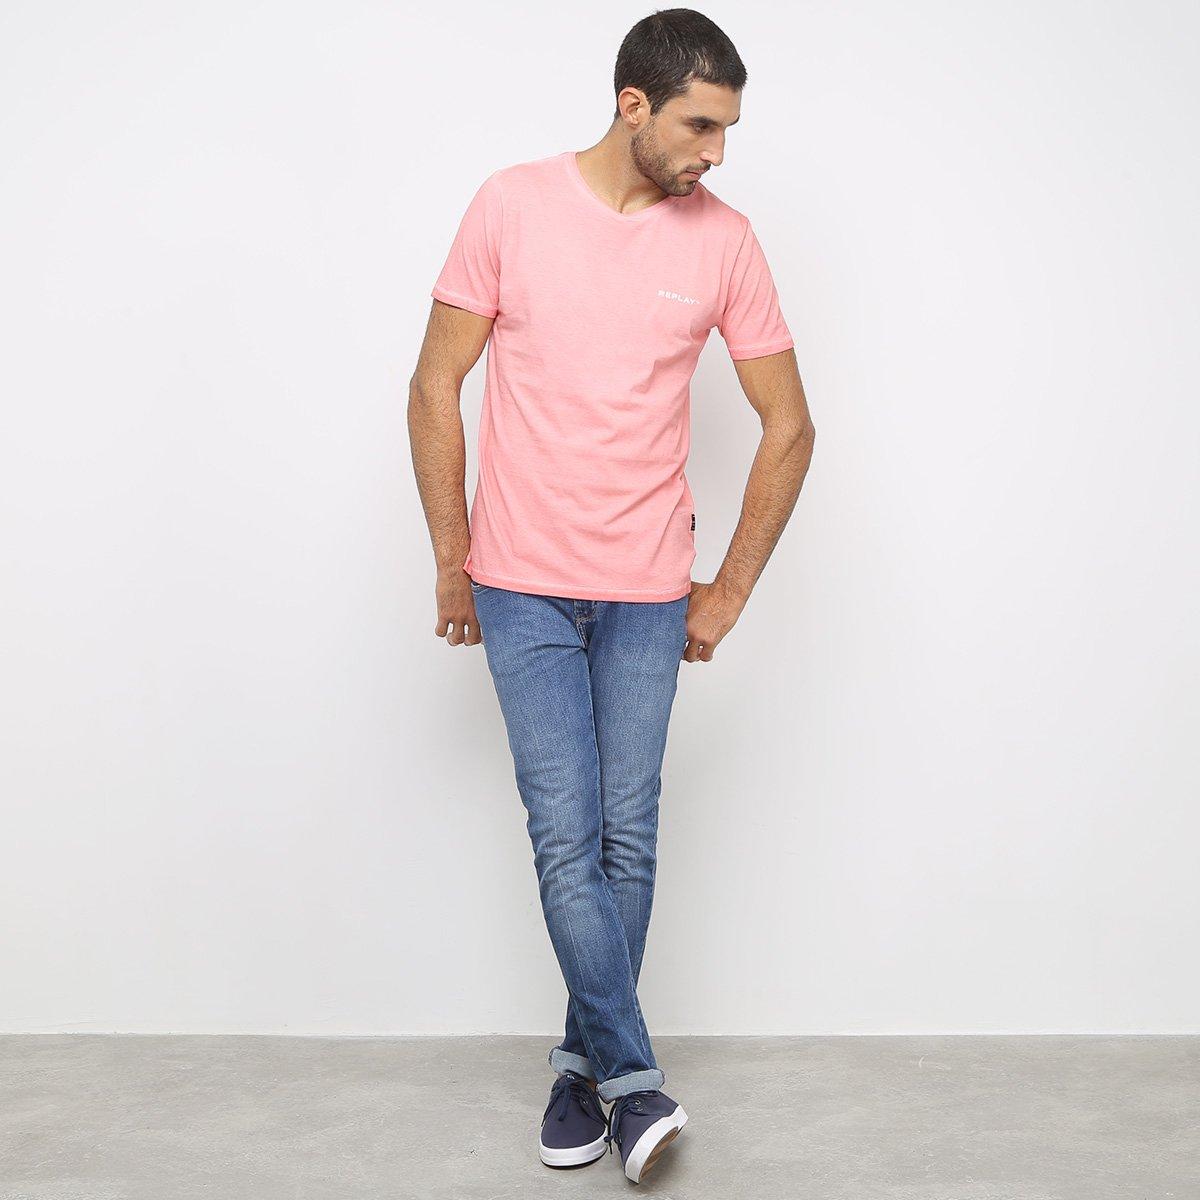 Camiseta Replay Básica Lisa Masculina - Rosa